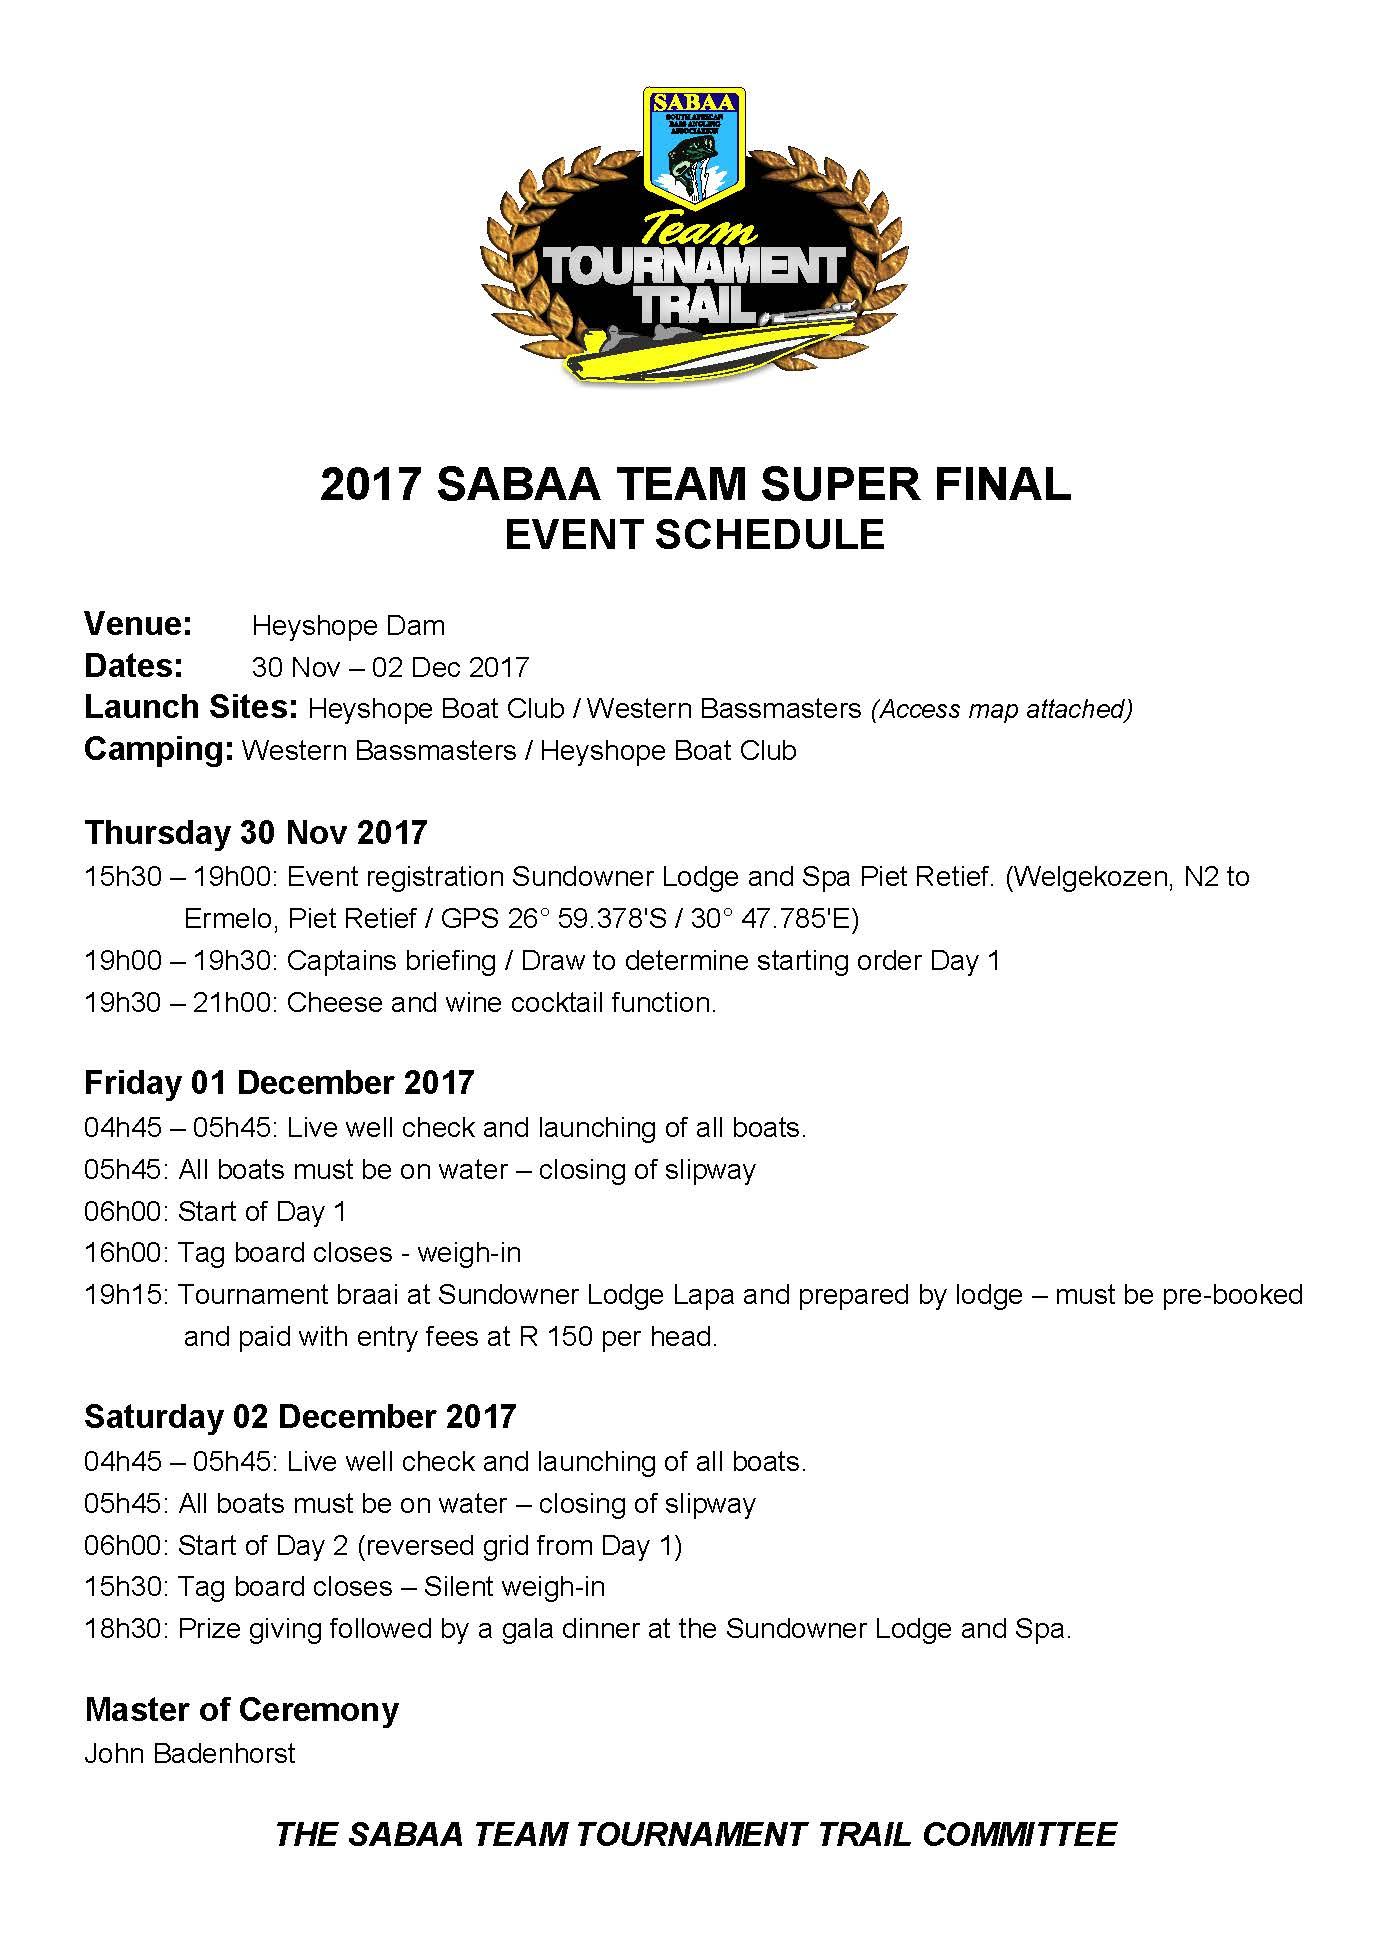 SABAA Final Event Schedule